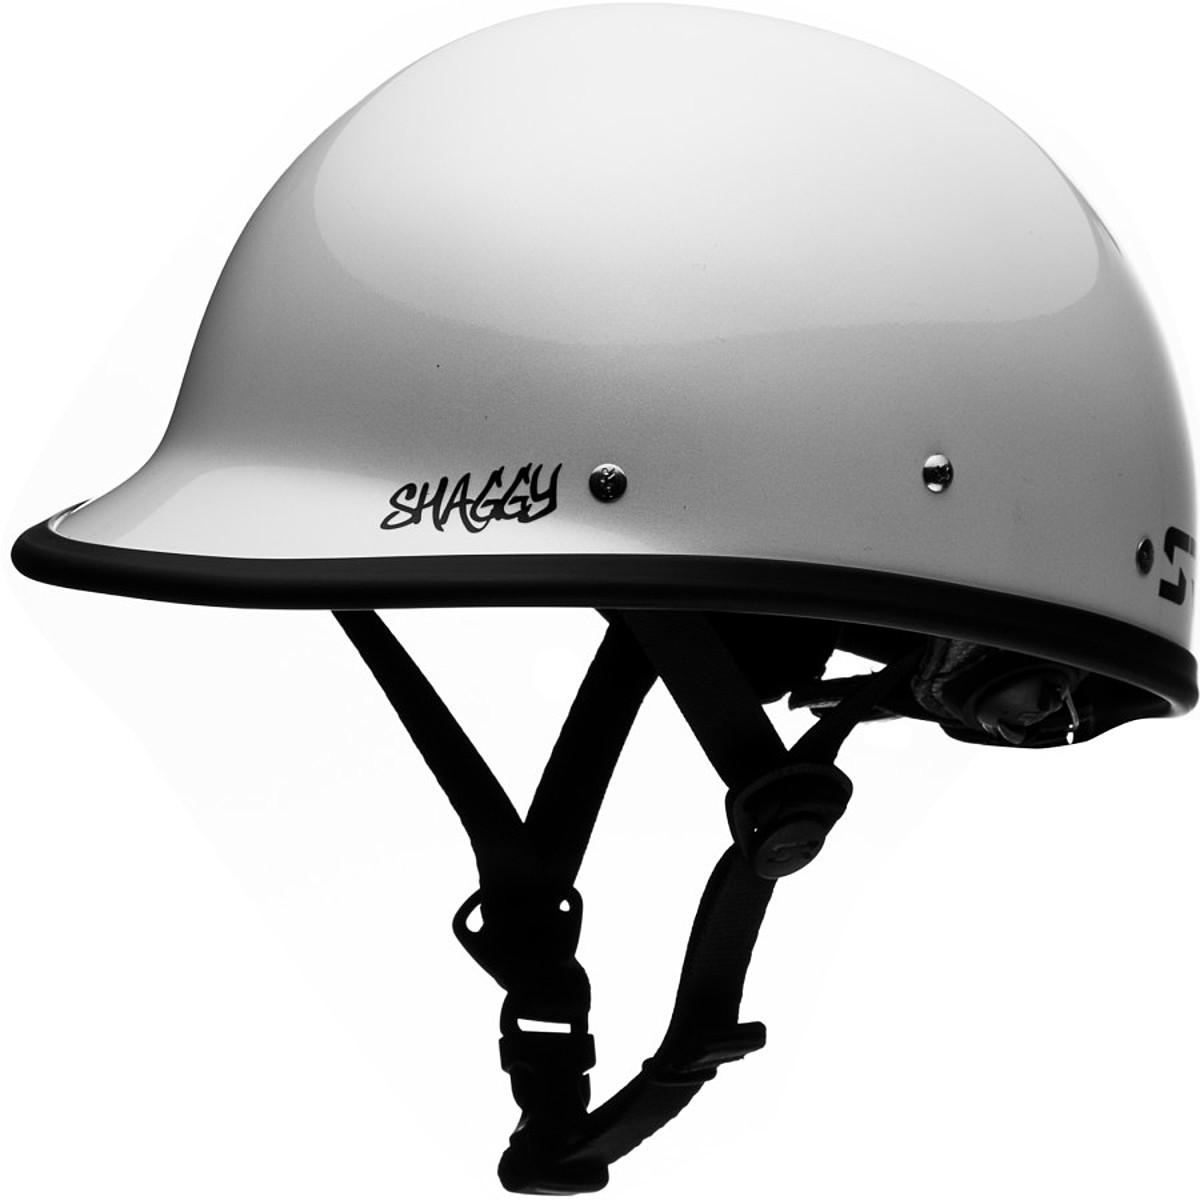 photo: Shred Ready Shaggy Helmet paddling helmet